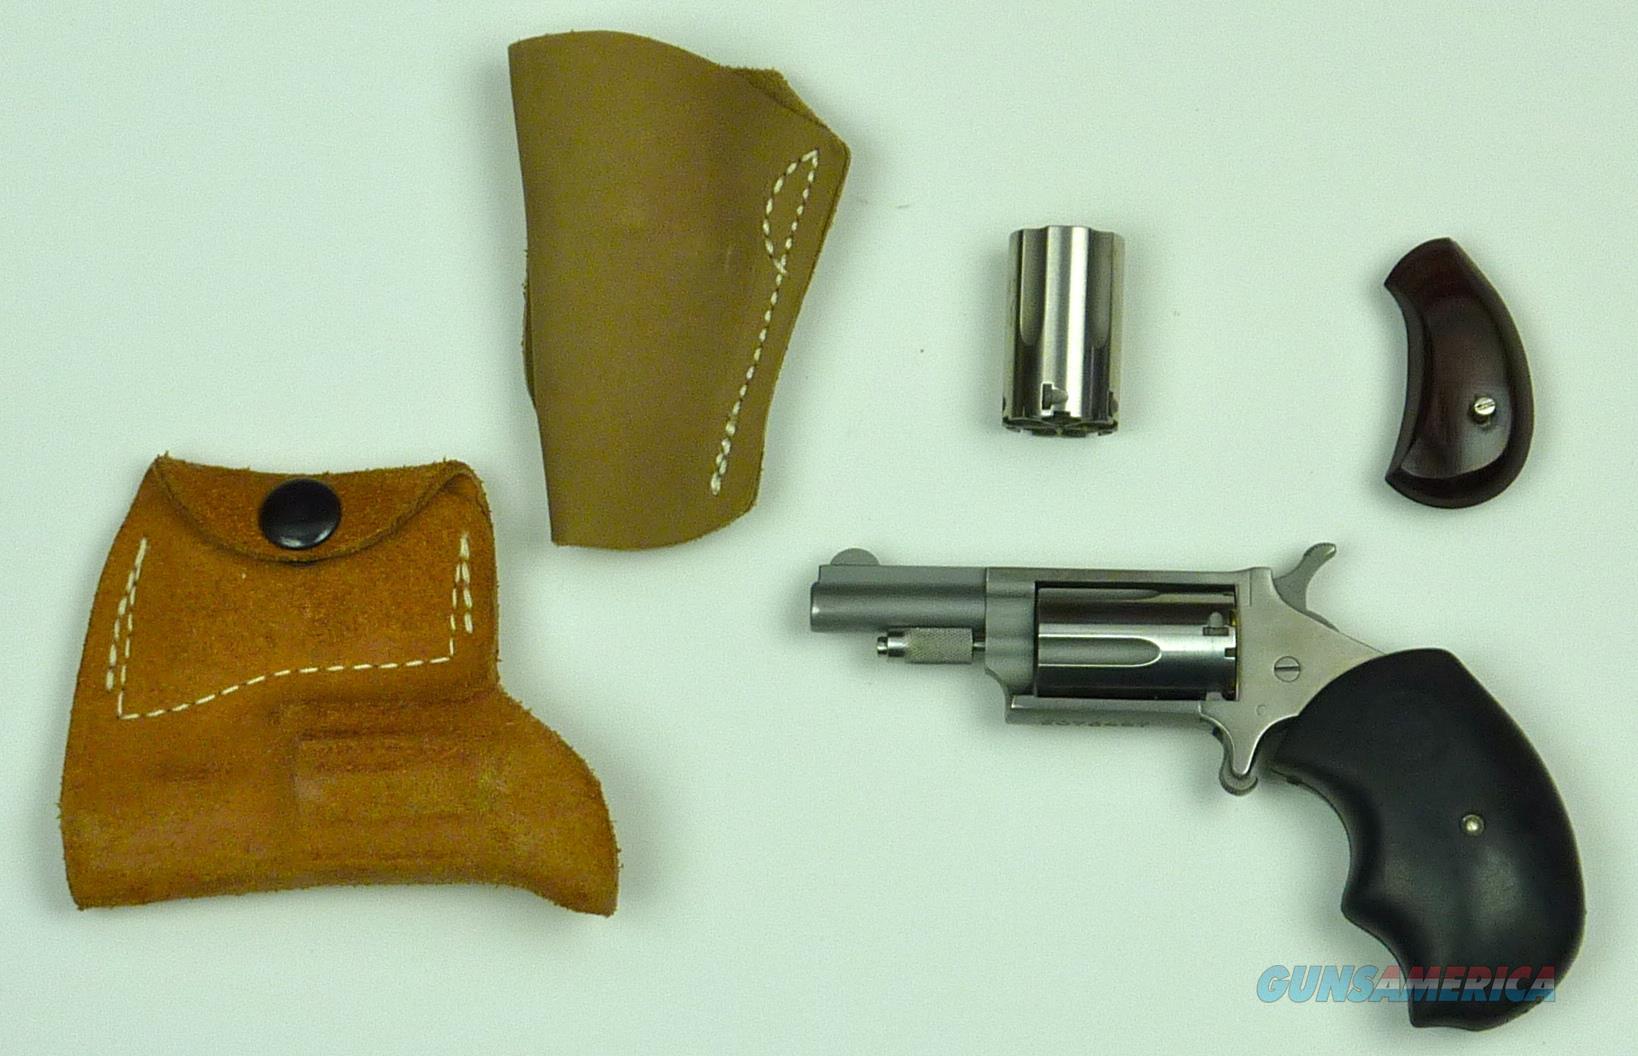 North American Arms Blackwidow Mini Revolver  Guns > Pistols > North American Arms Pistols